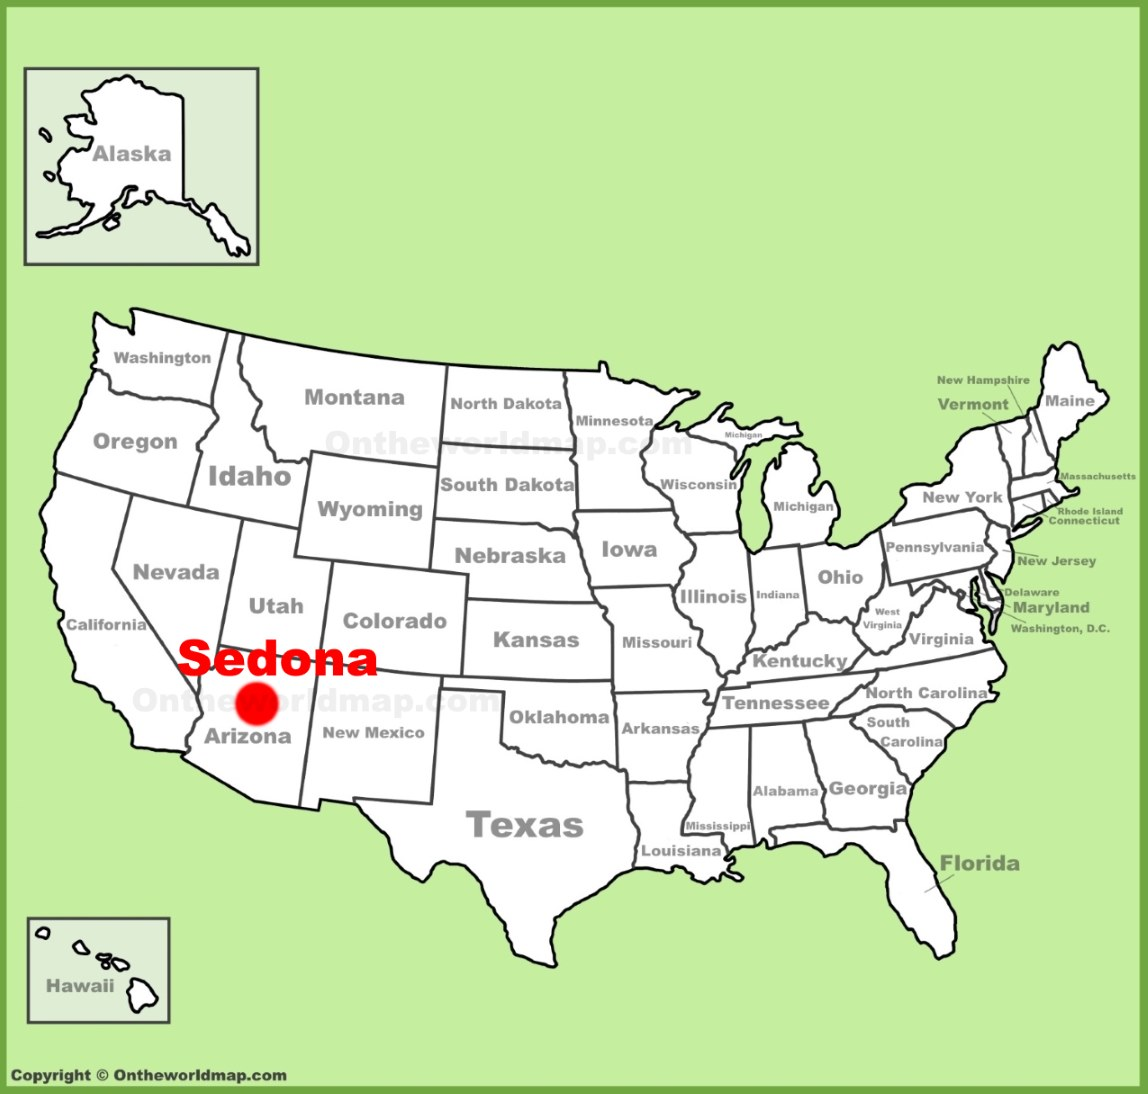 Sedona location on the U.S. Map